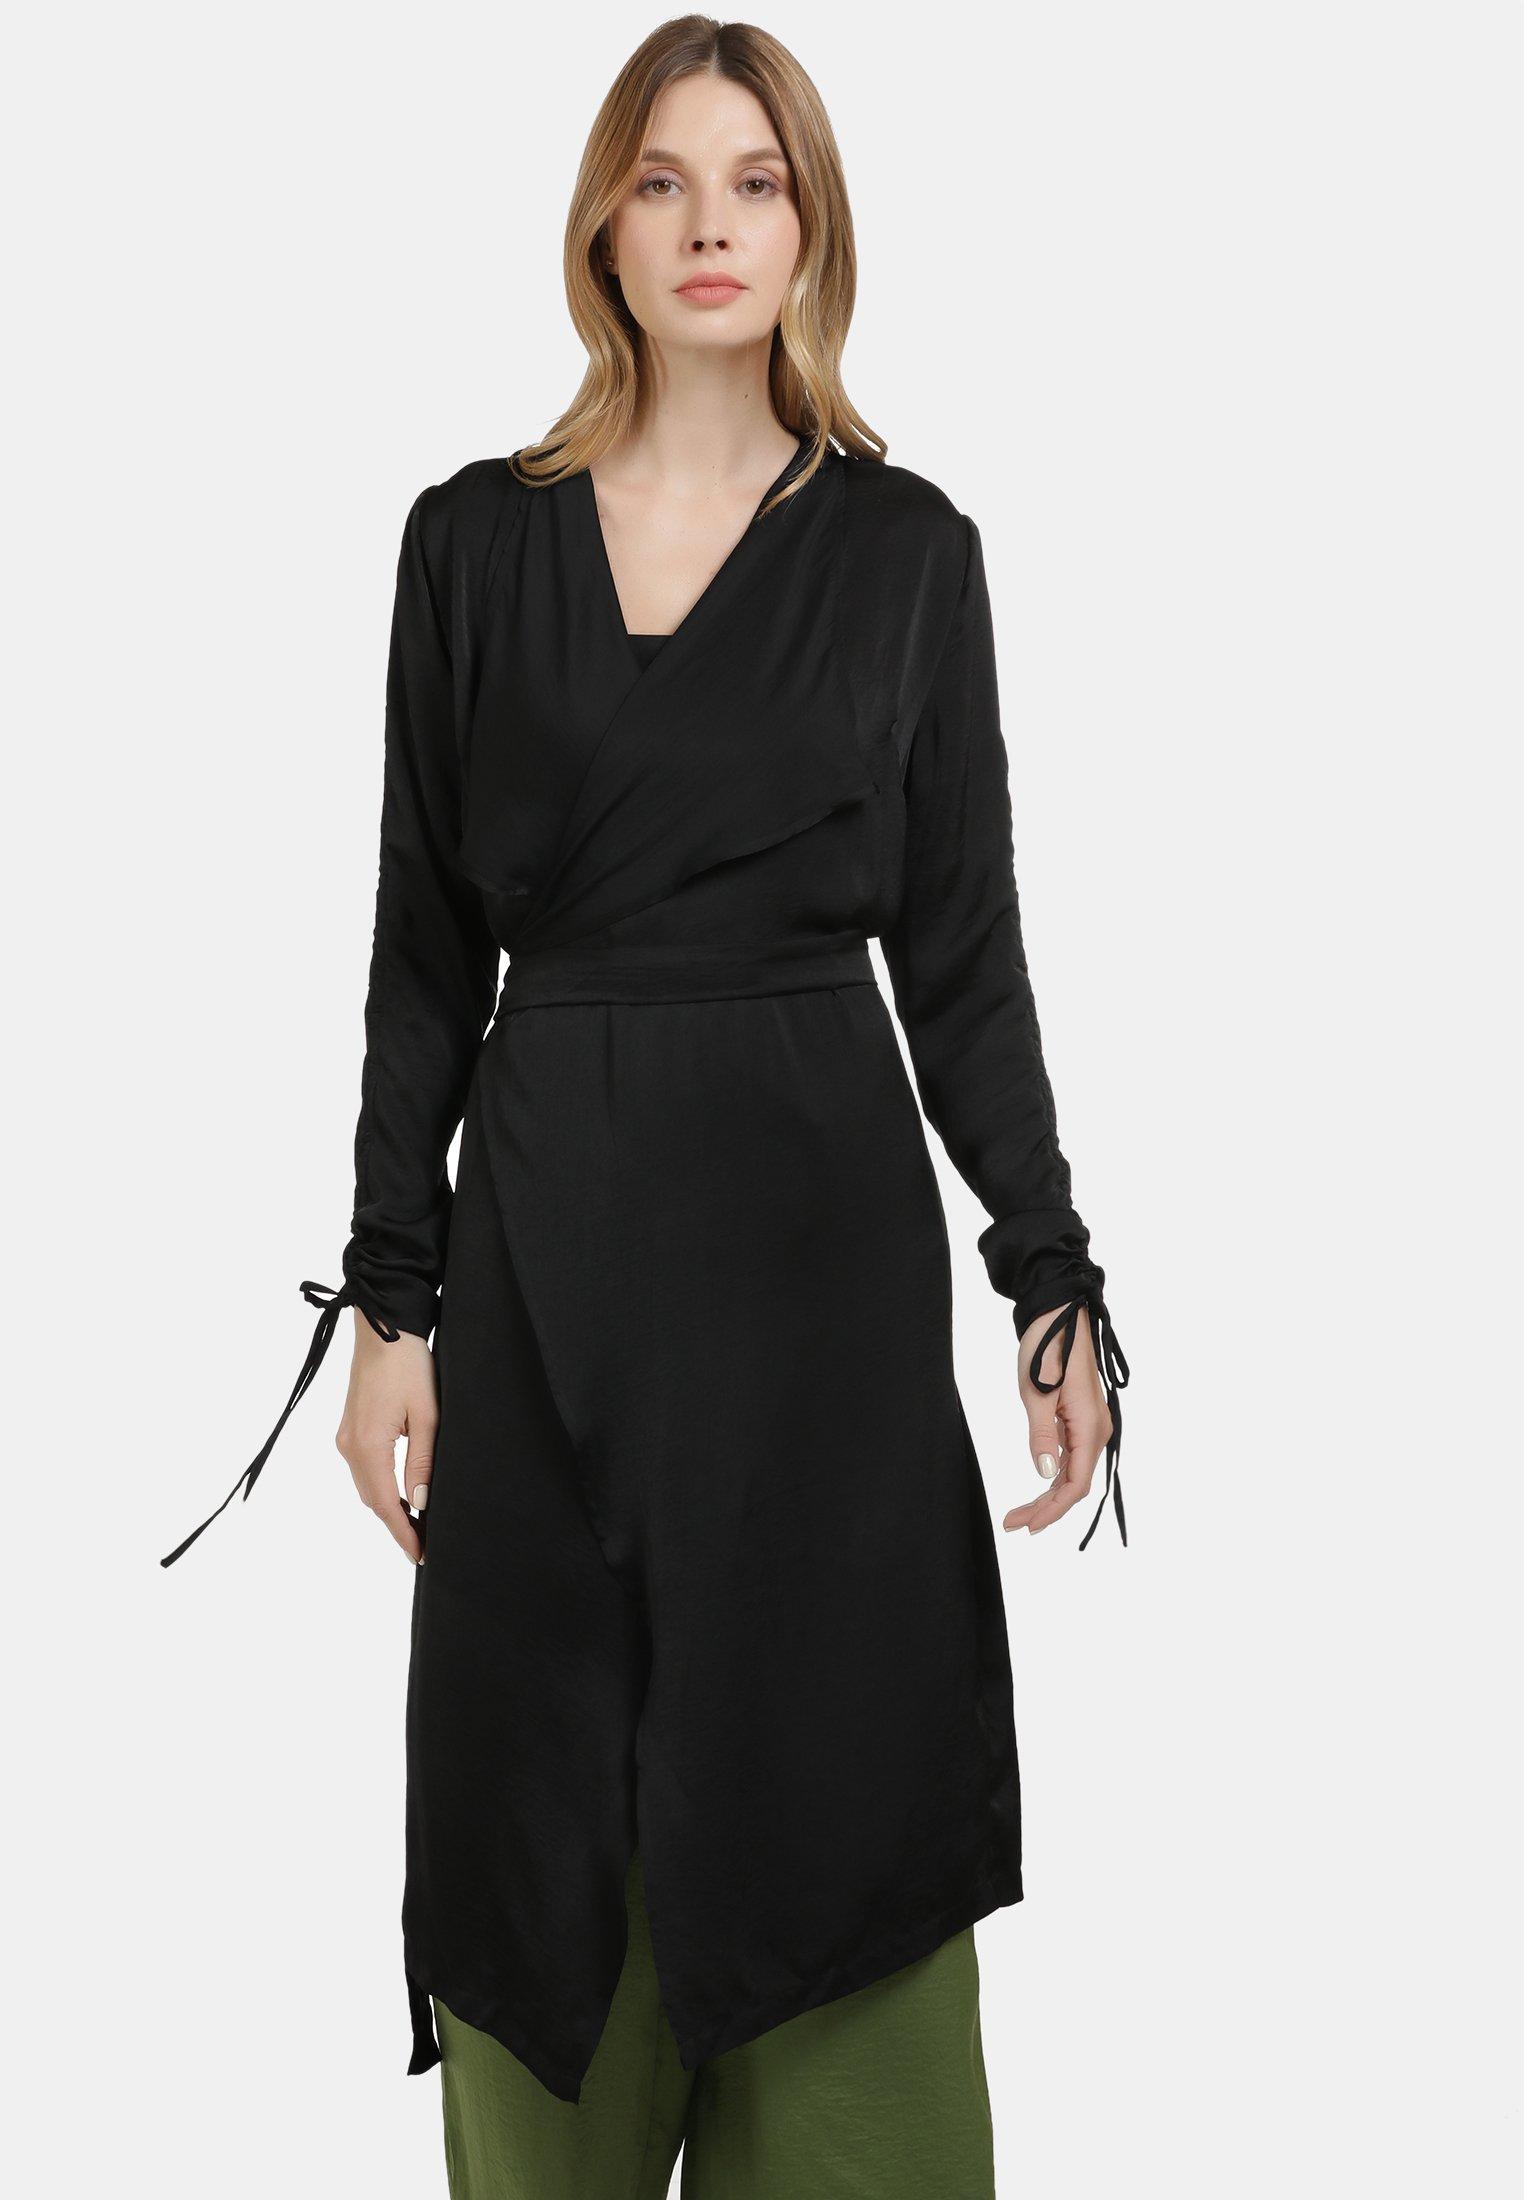 Damen SOMMERMANTEL - Leichte Jacke